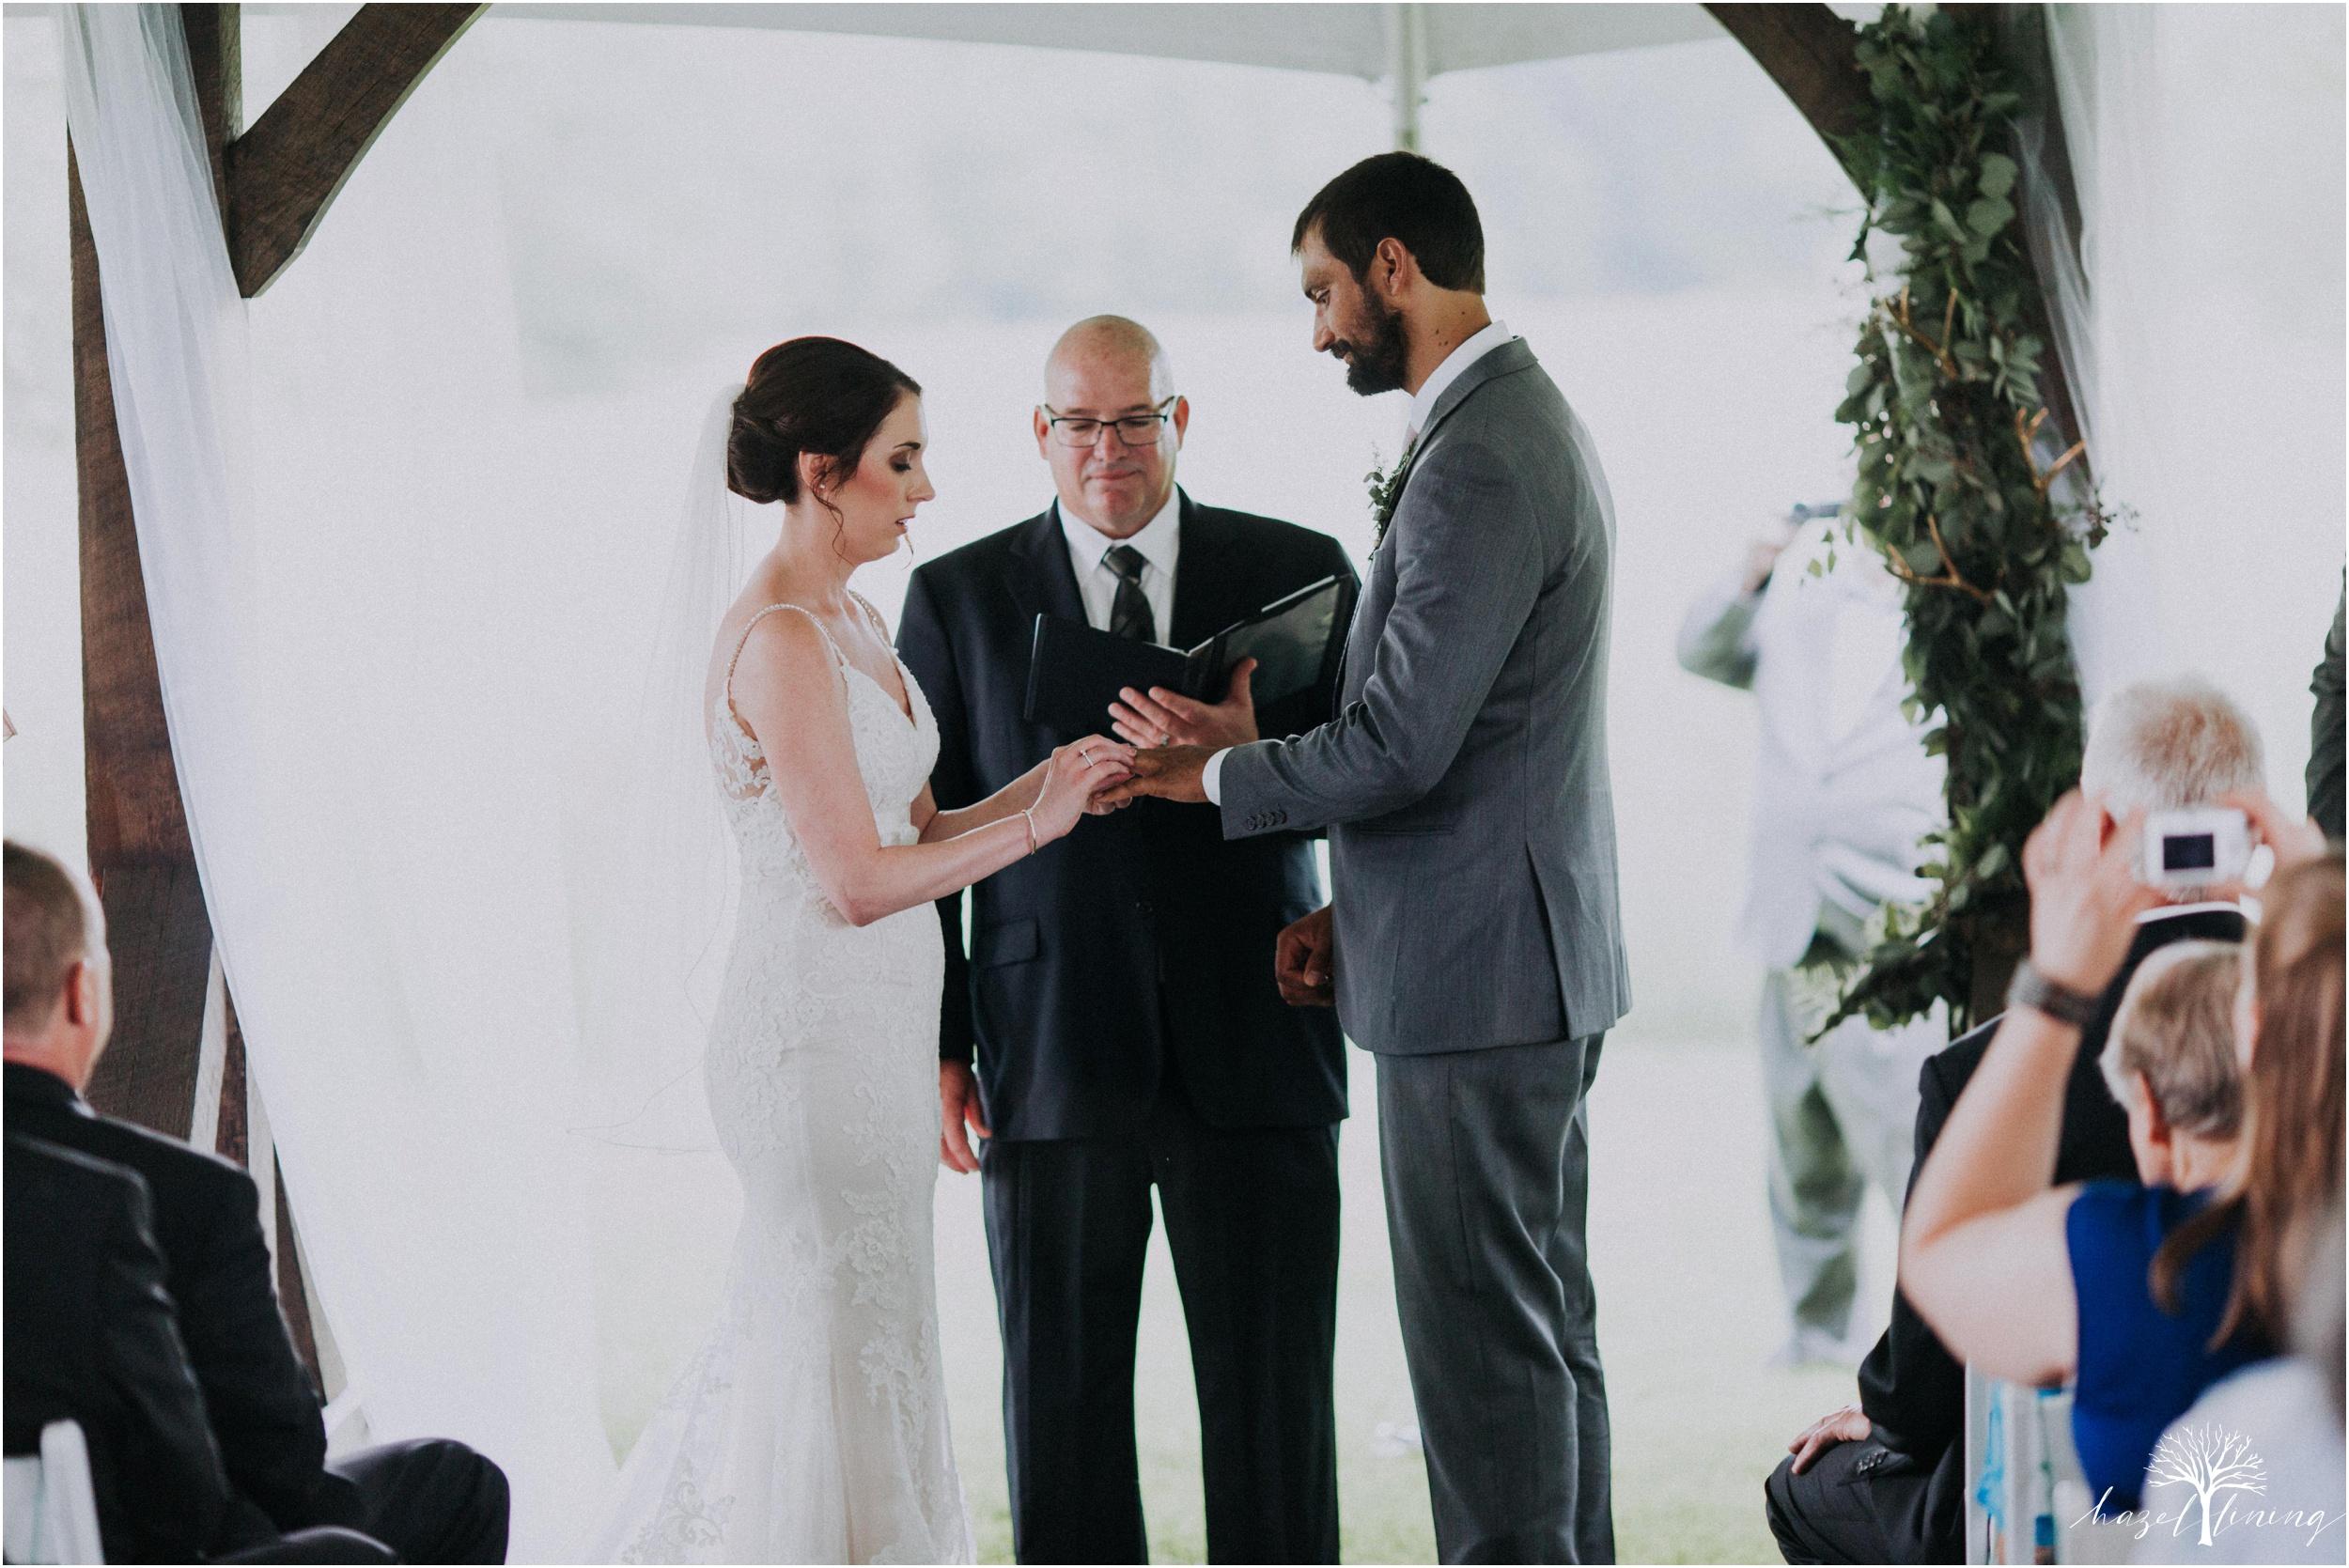 hazel-lining-travel-wedding-elopement-photography-lisa-landon-shoemaker-the-farm-bakery-and-events-bucks-county-quakertown-pennsylvania-summer-country-outdoor-farm-wedding_0063.jpg